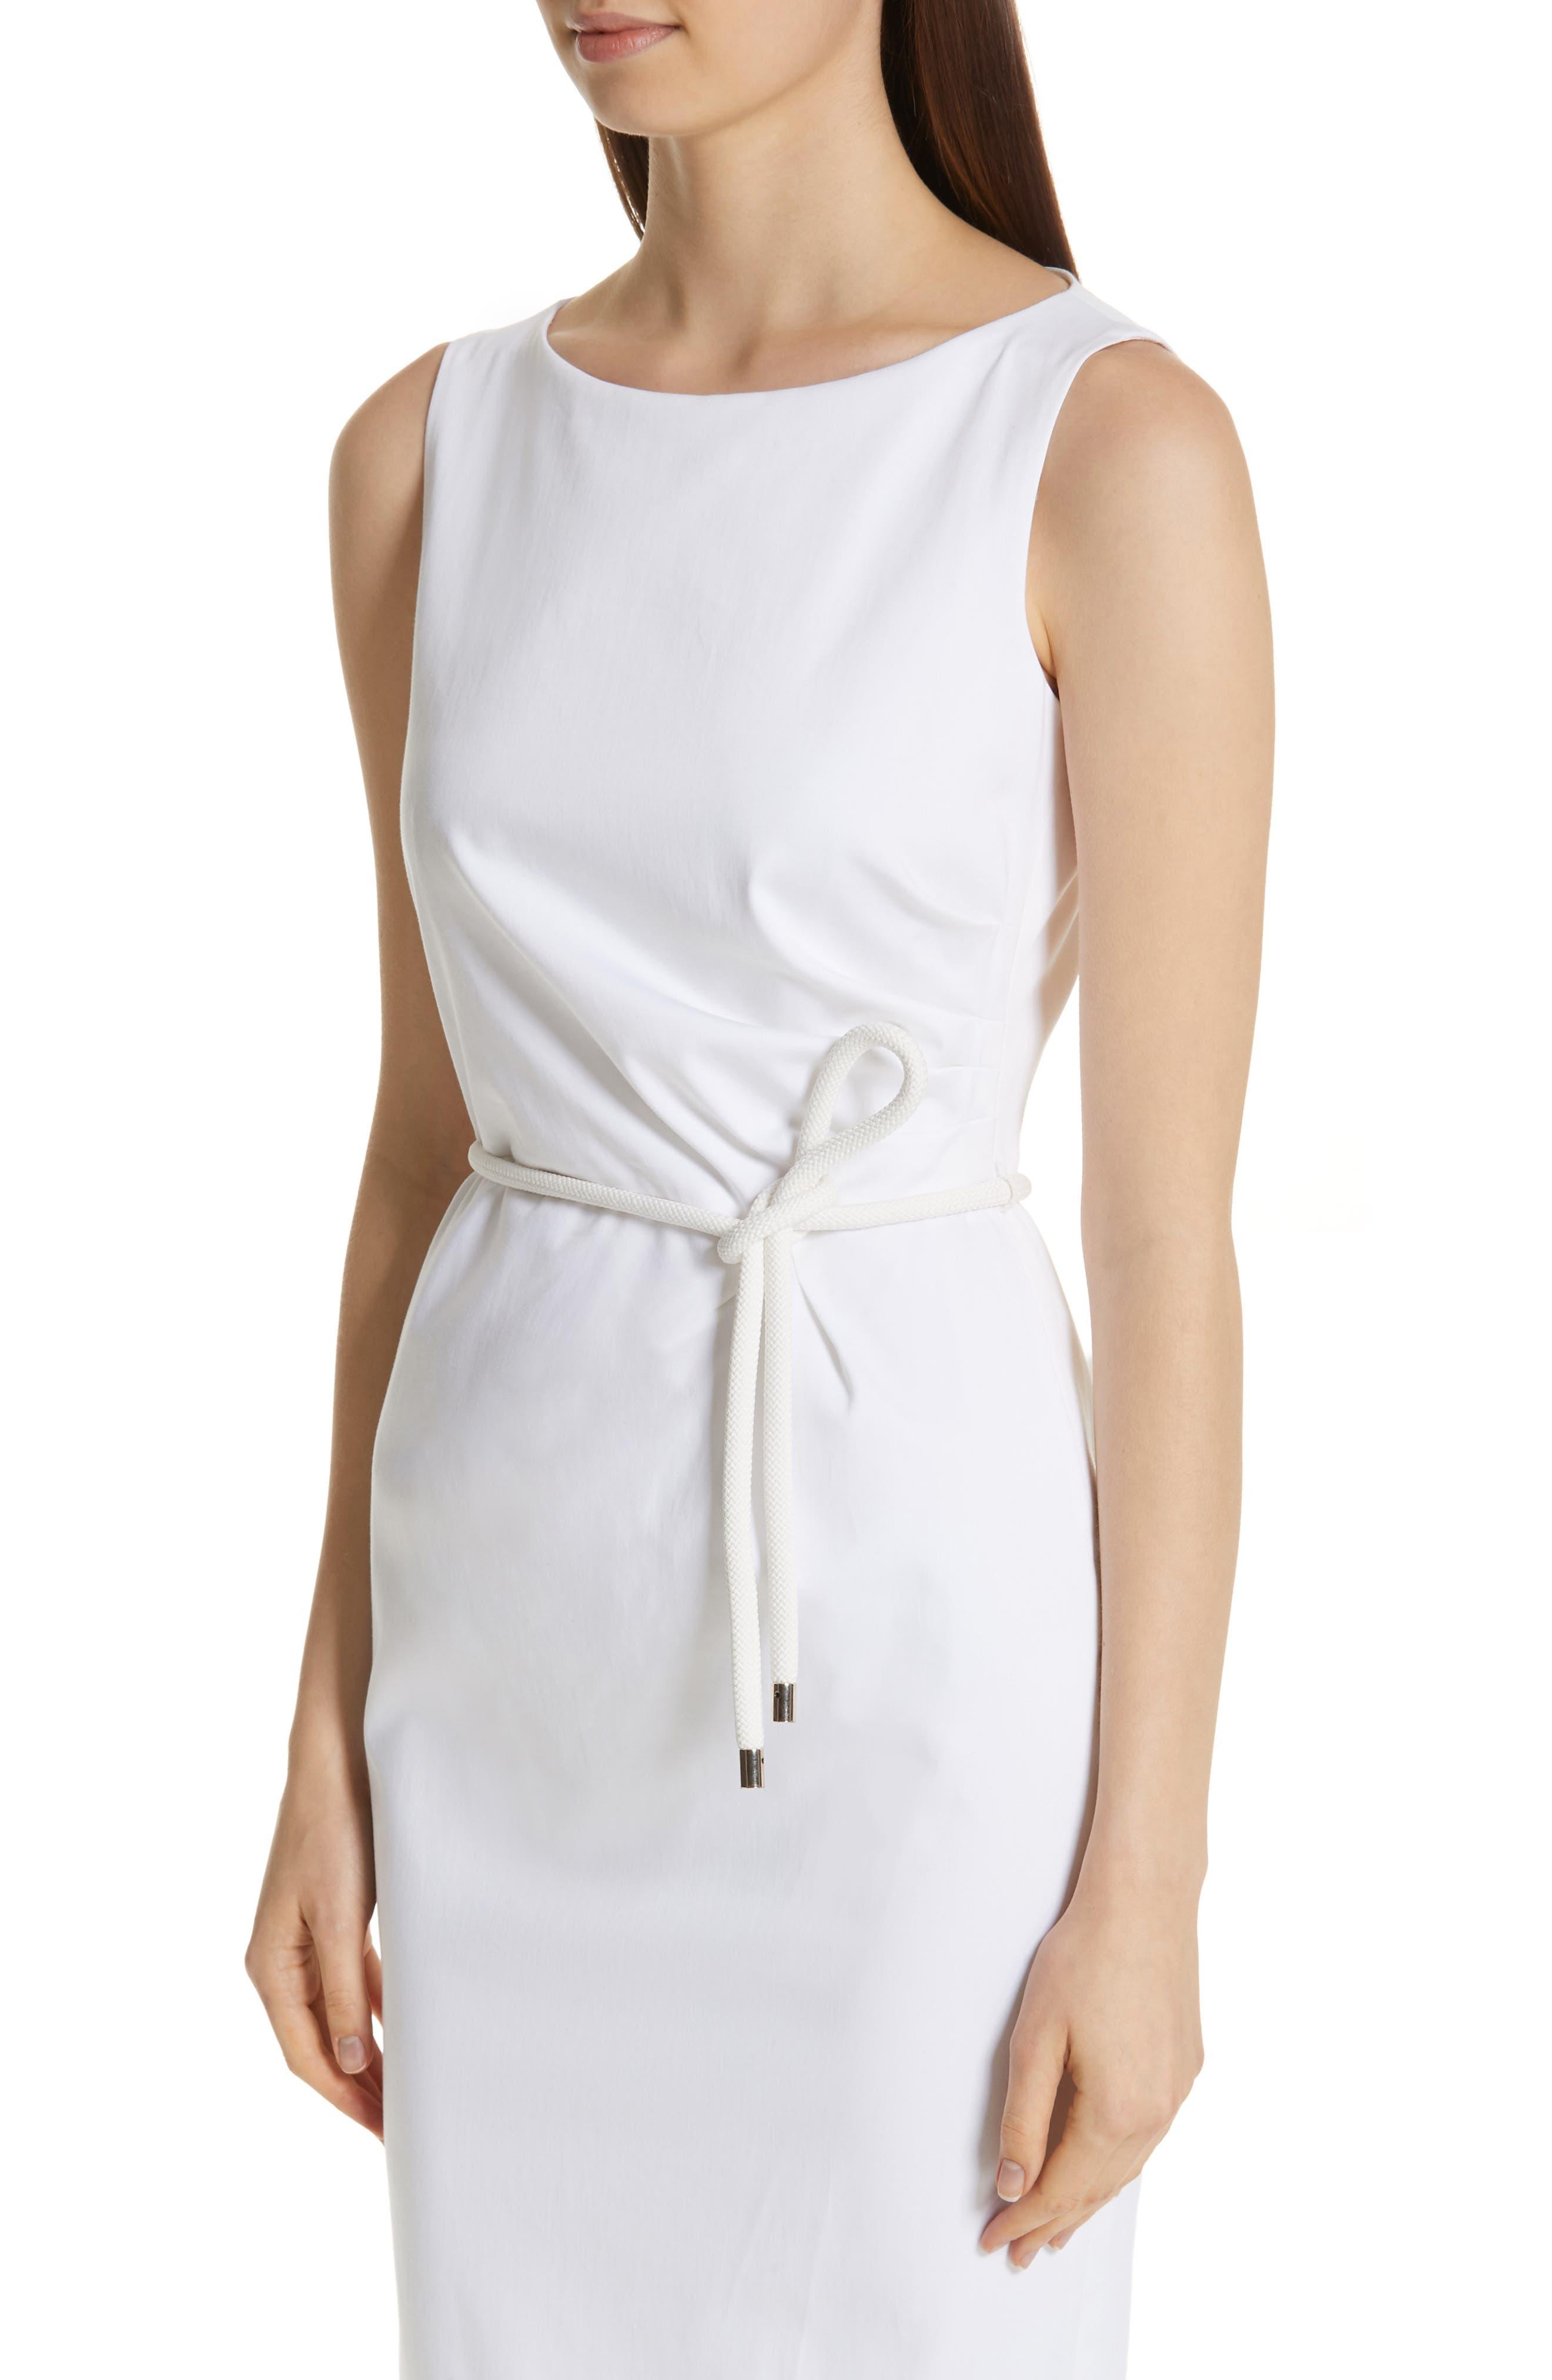 MAX MARA, Cordoba Sheath Dress, Alternate thumbnail 6, color, OPTICAL WHITE